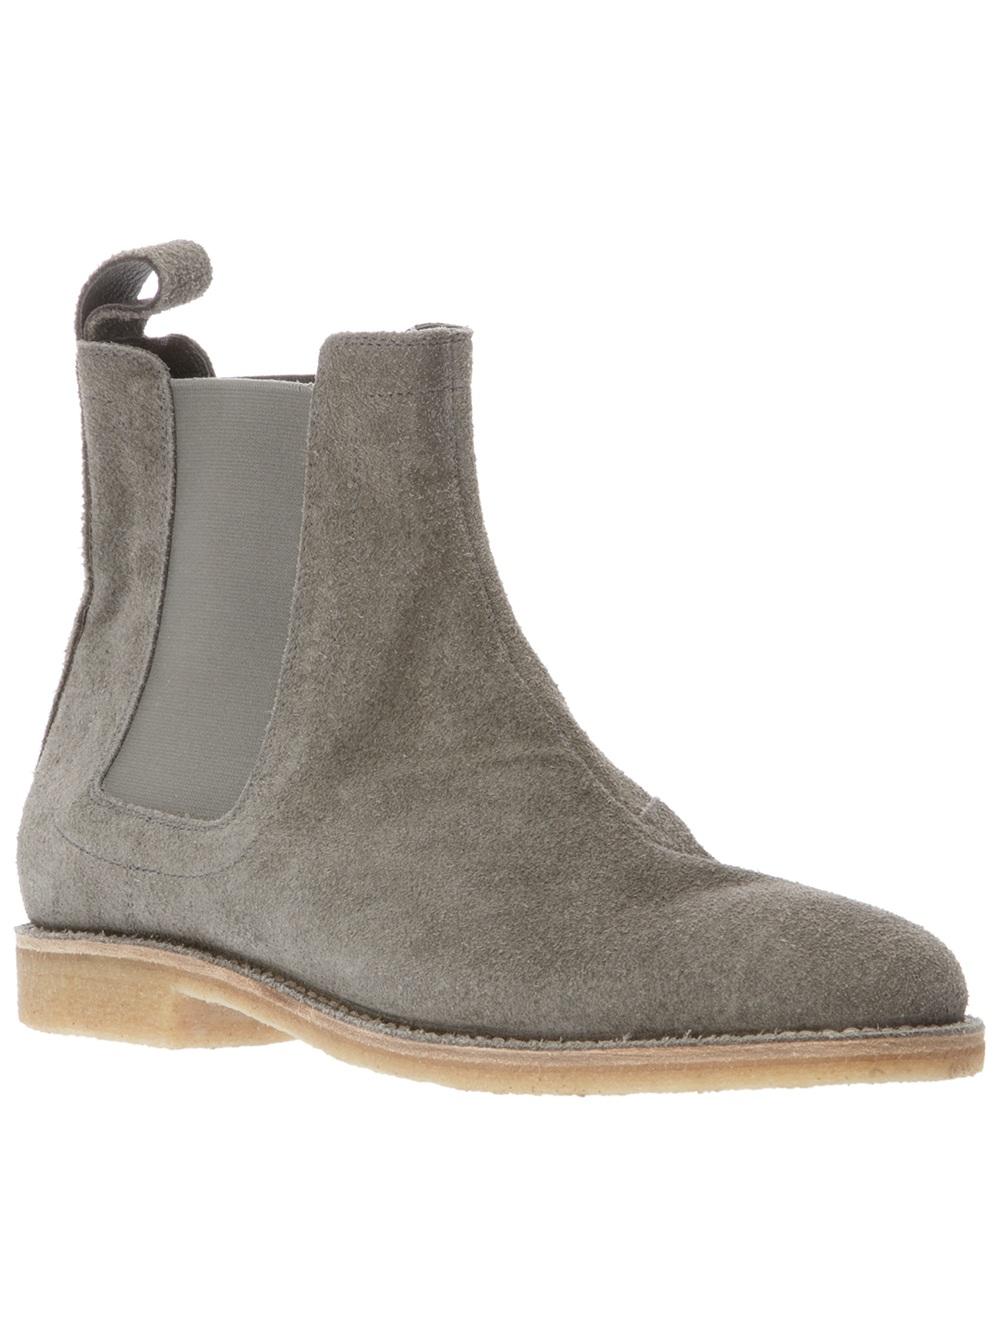 bottega veneta buffalo suede chelsea boots in gray for men lyst. Black Bedroom Furniture Sets. Home Design Ideas